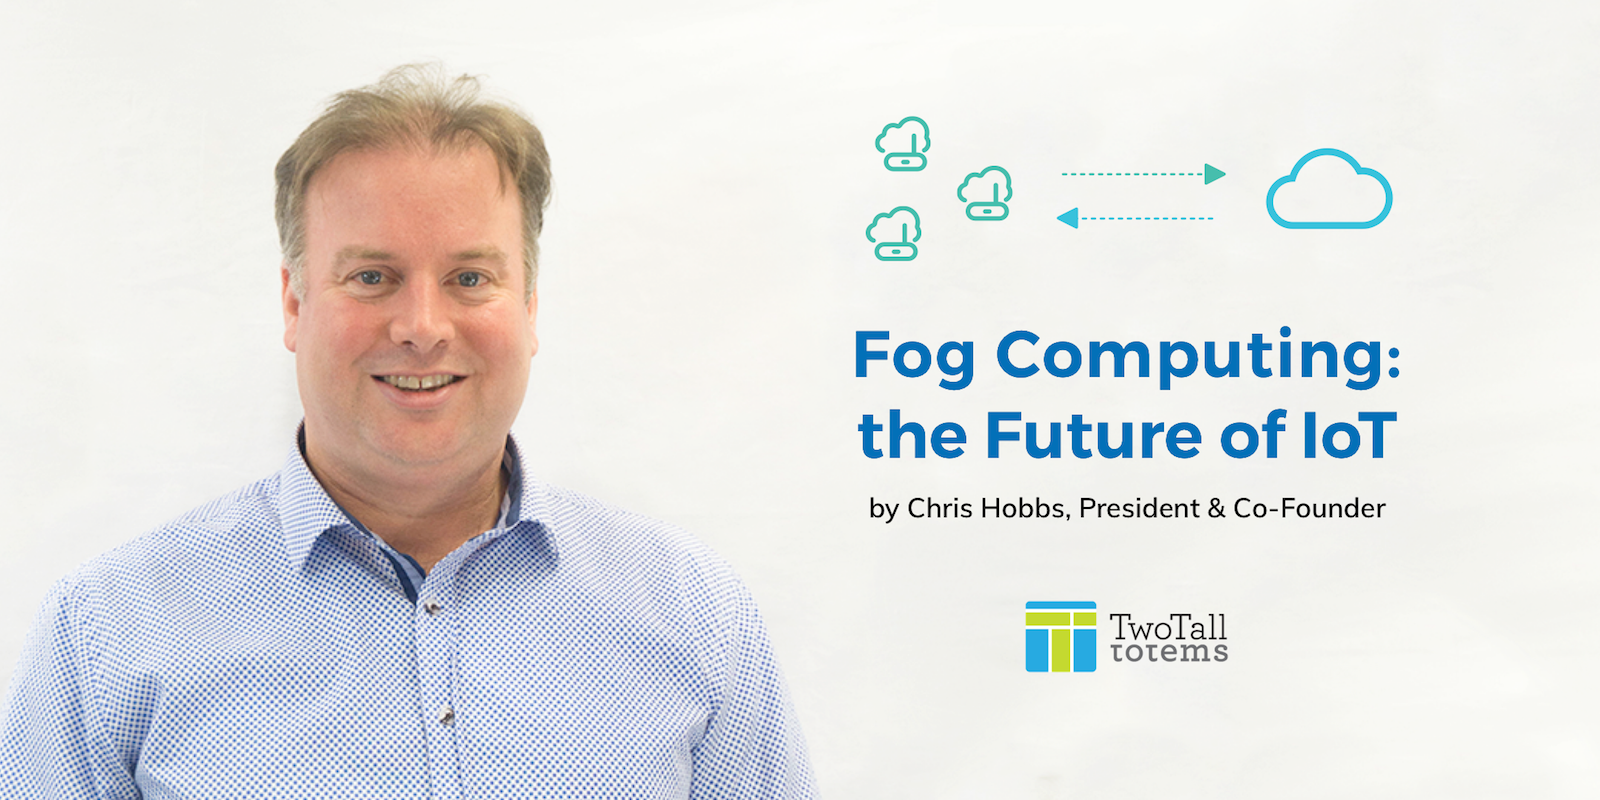 Fog Computing: The Future of IoT